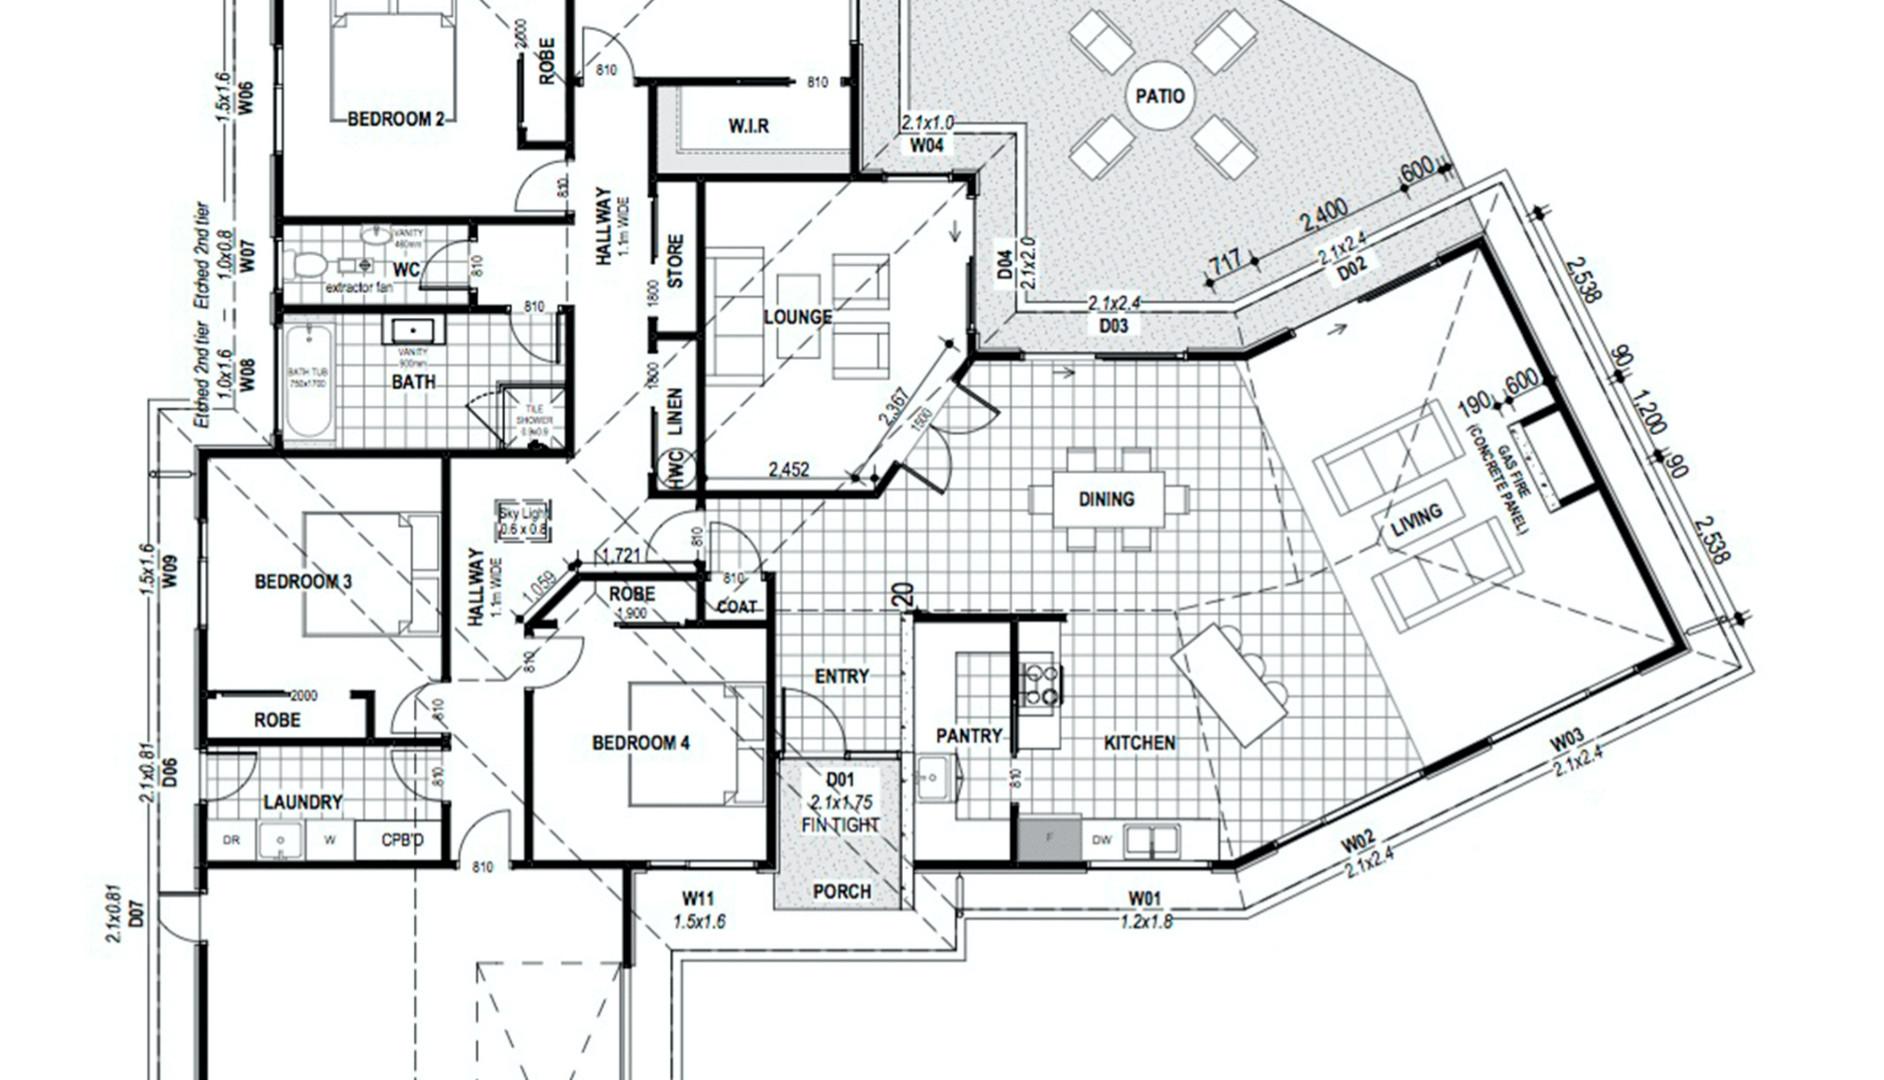 Liffey Springs Floorplan